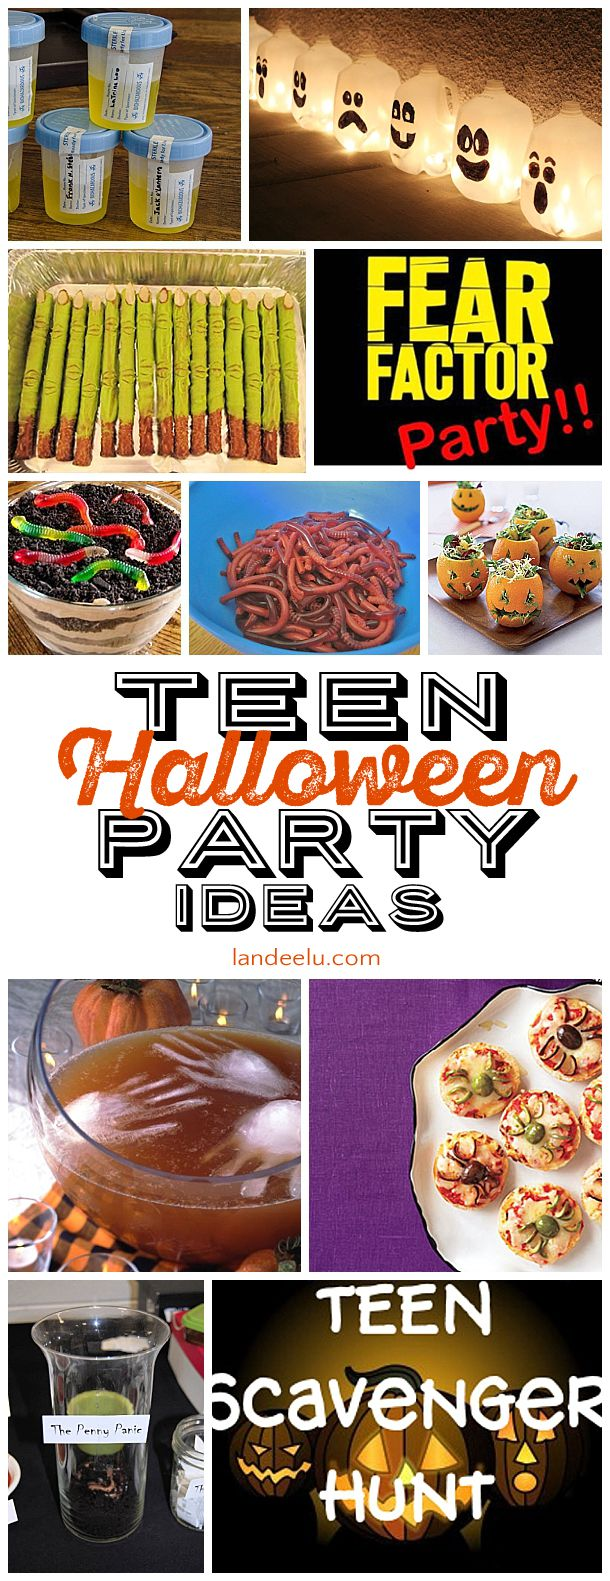 942 best images about ☼ Halloween on Pinterest | Halloween ...